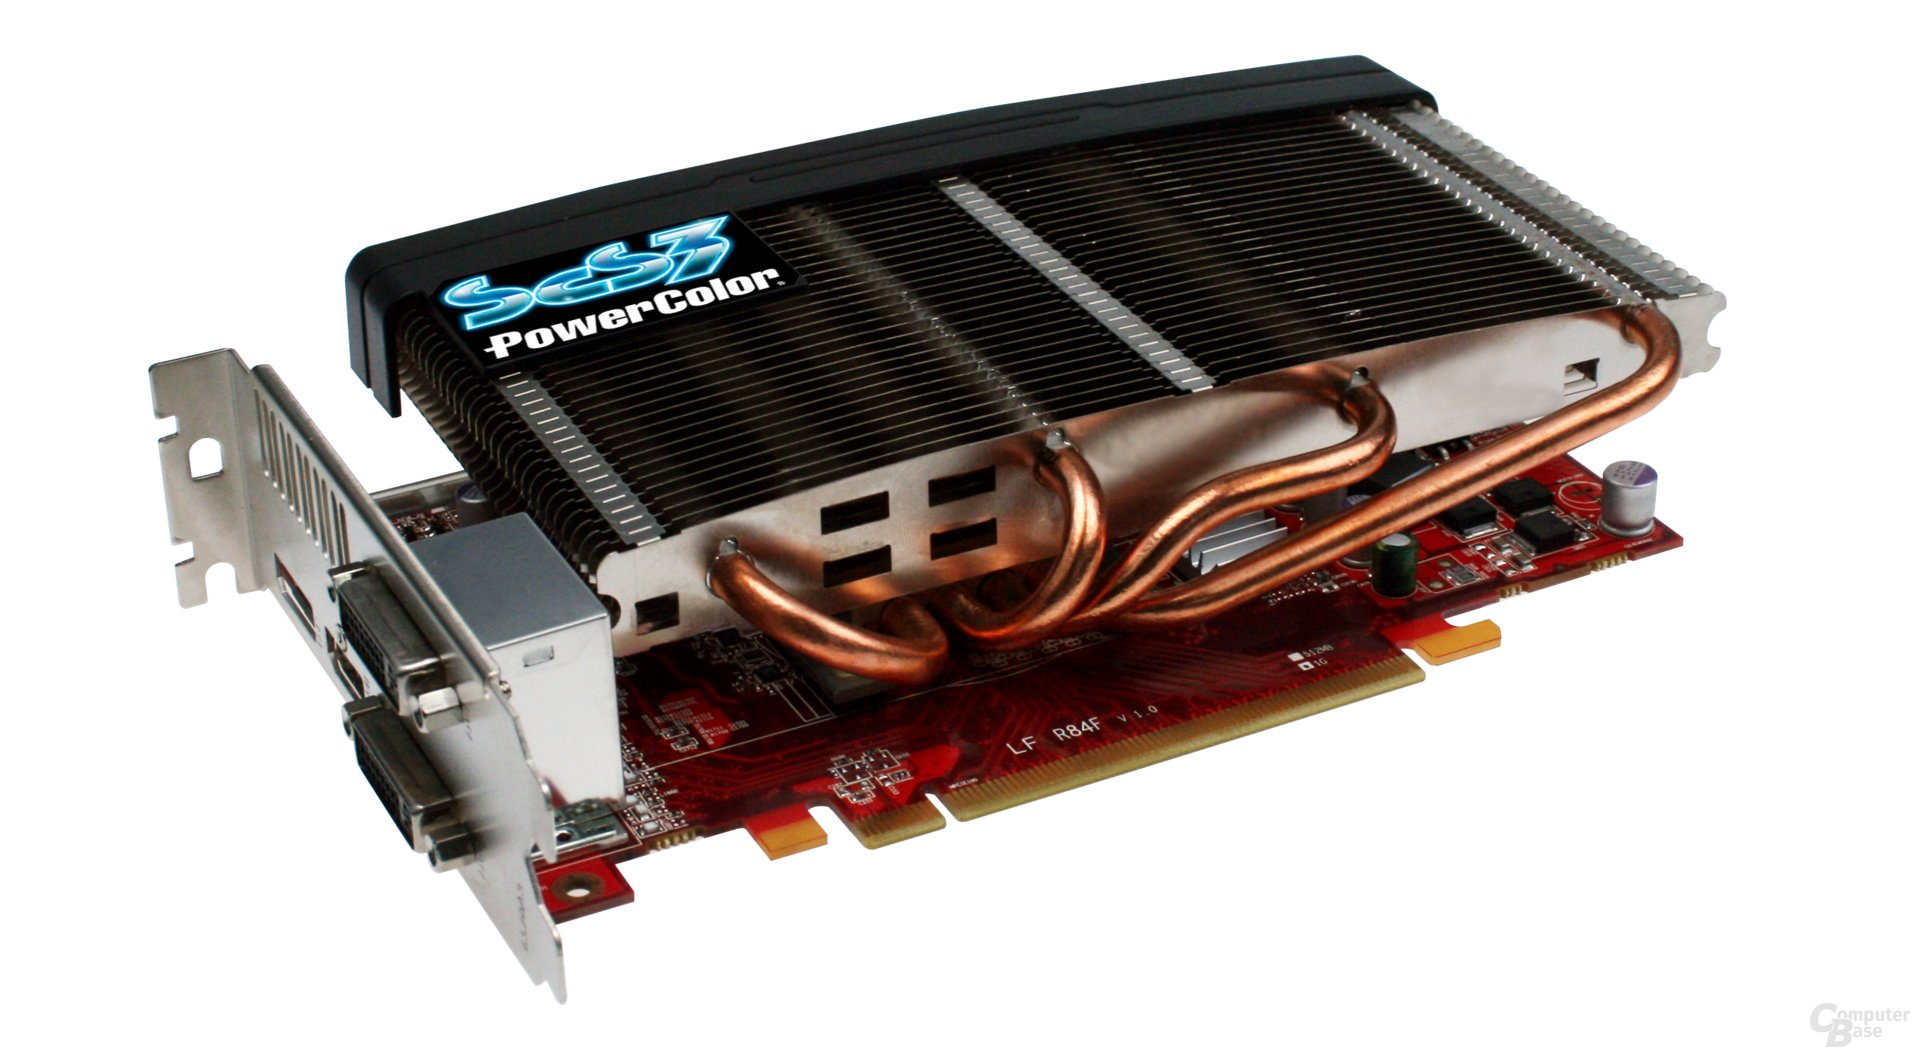 PowerColor Radeon HD 5750 SCS3